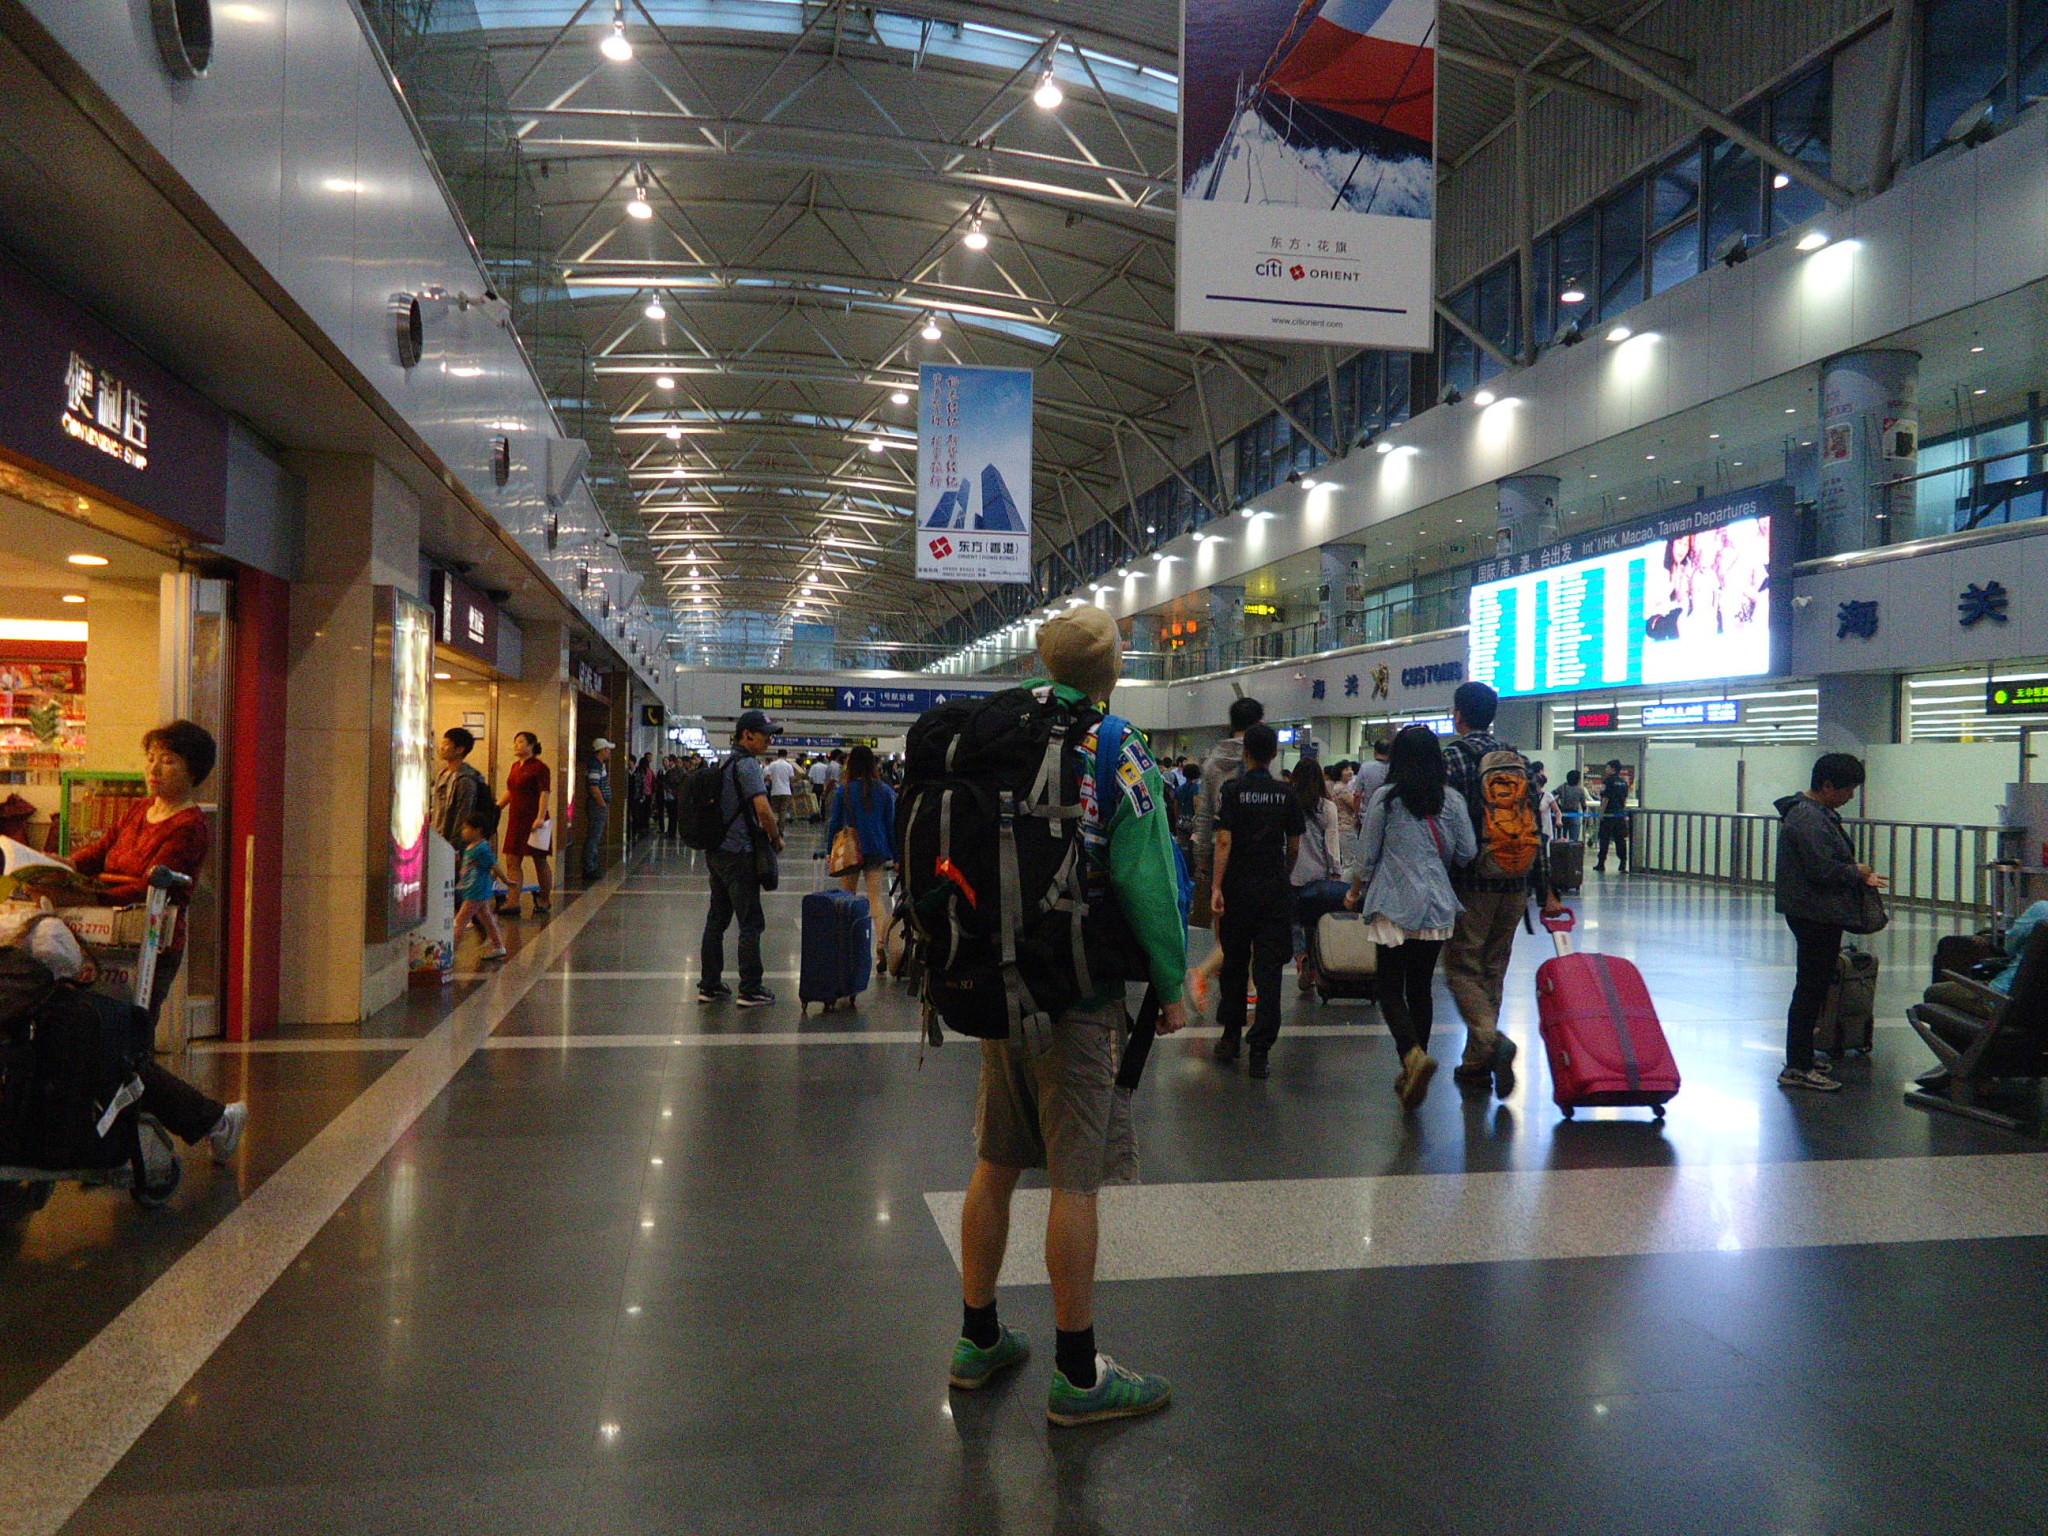 airline companies baggage jonny blair